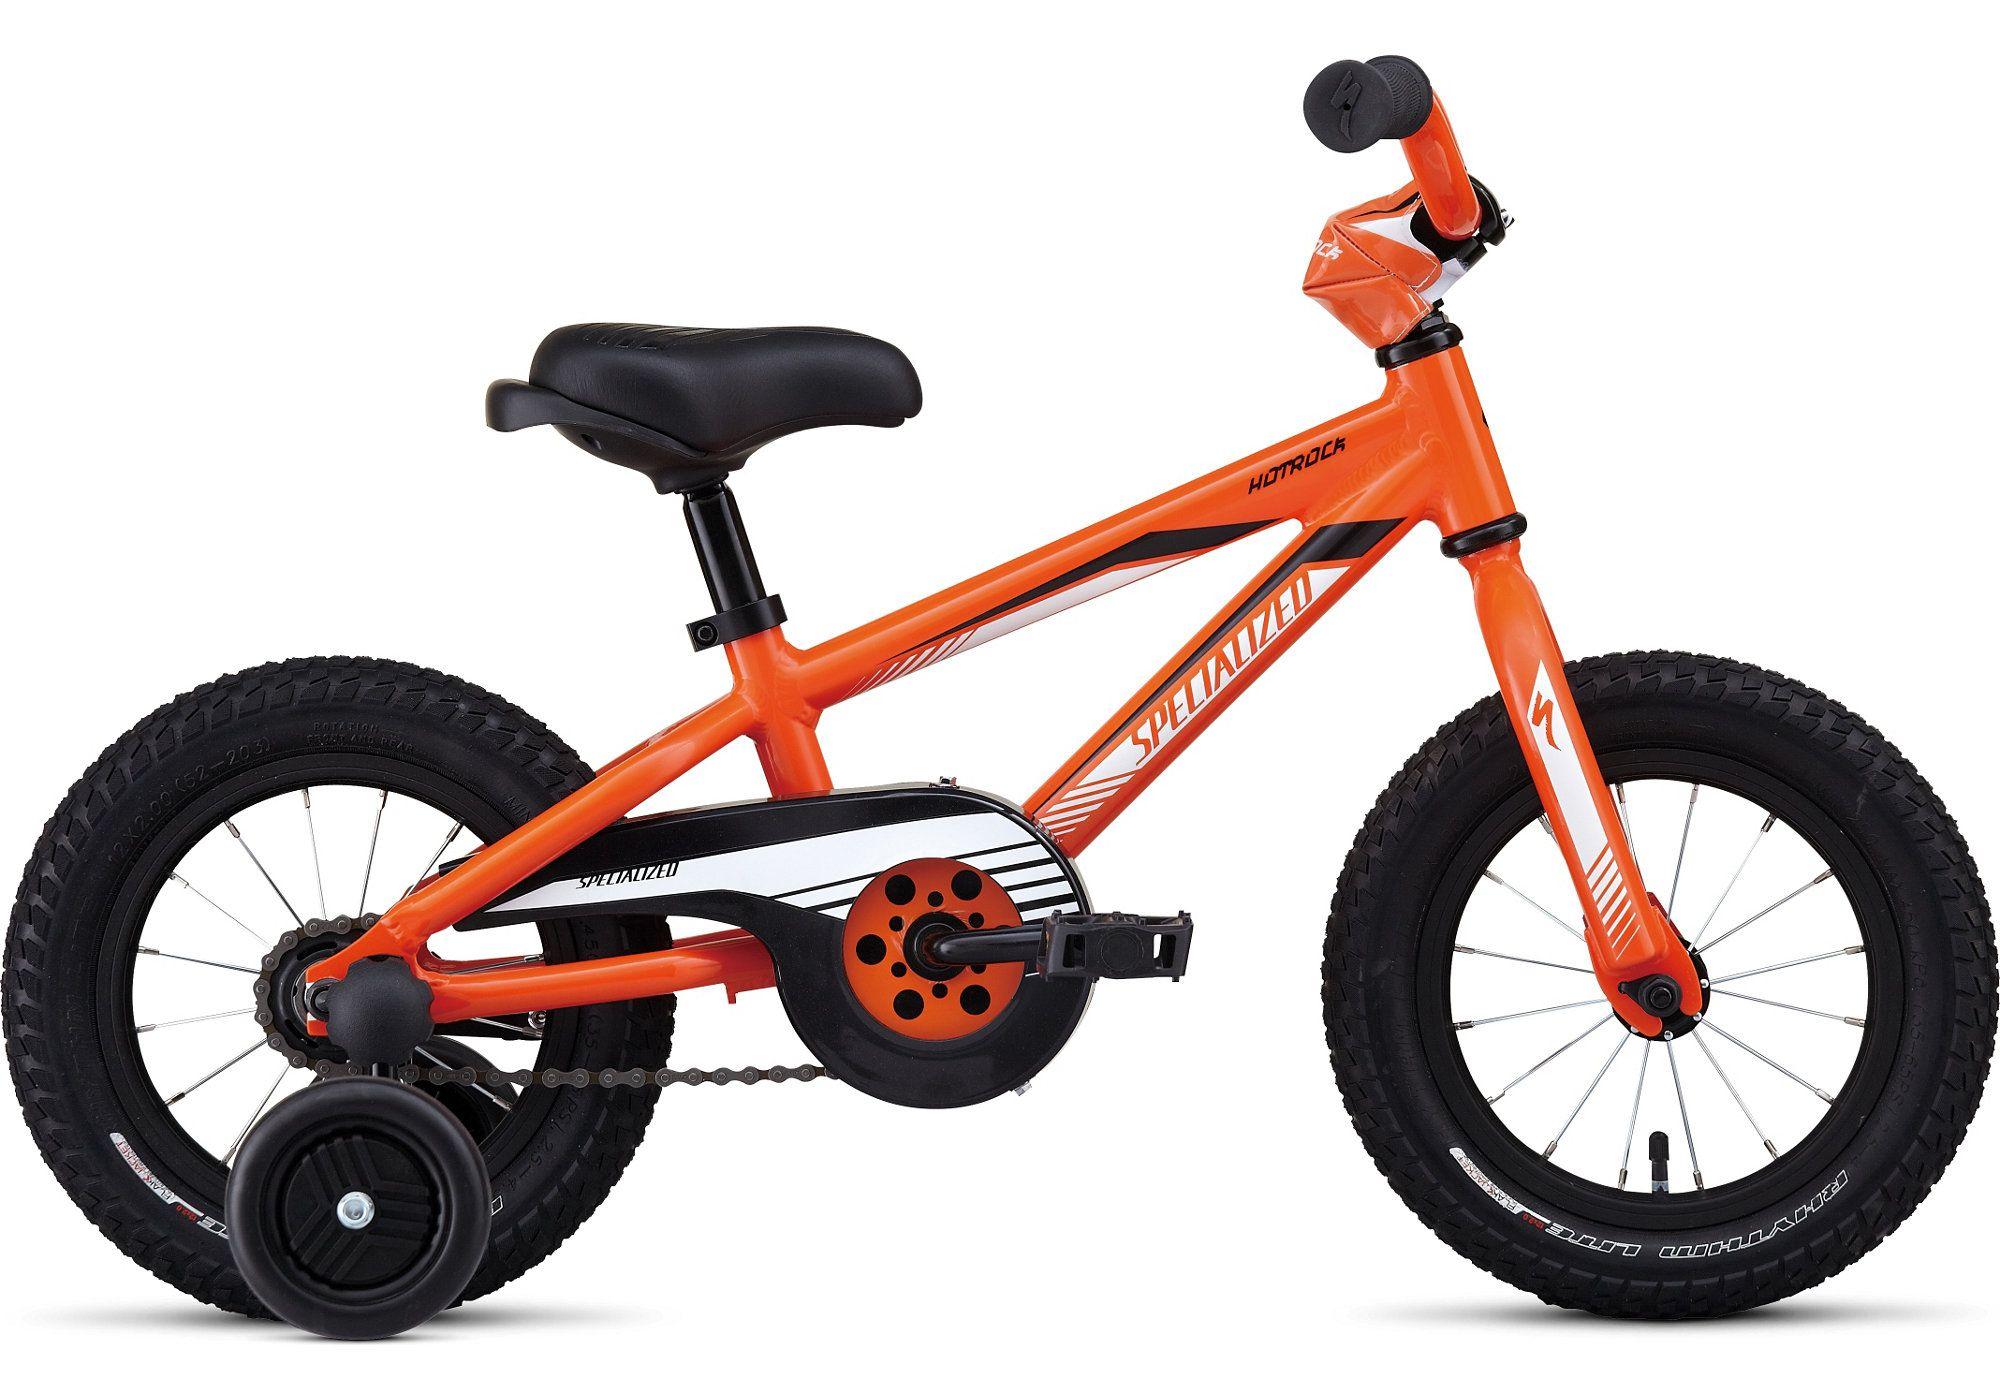 Велосипед Specialized Hotrock 12 CSTR Int 2016 велосипед specialized hotrock 20 6 speed boys 2016